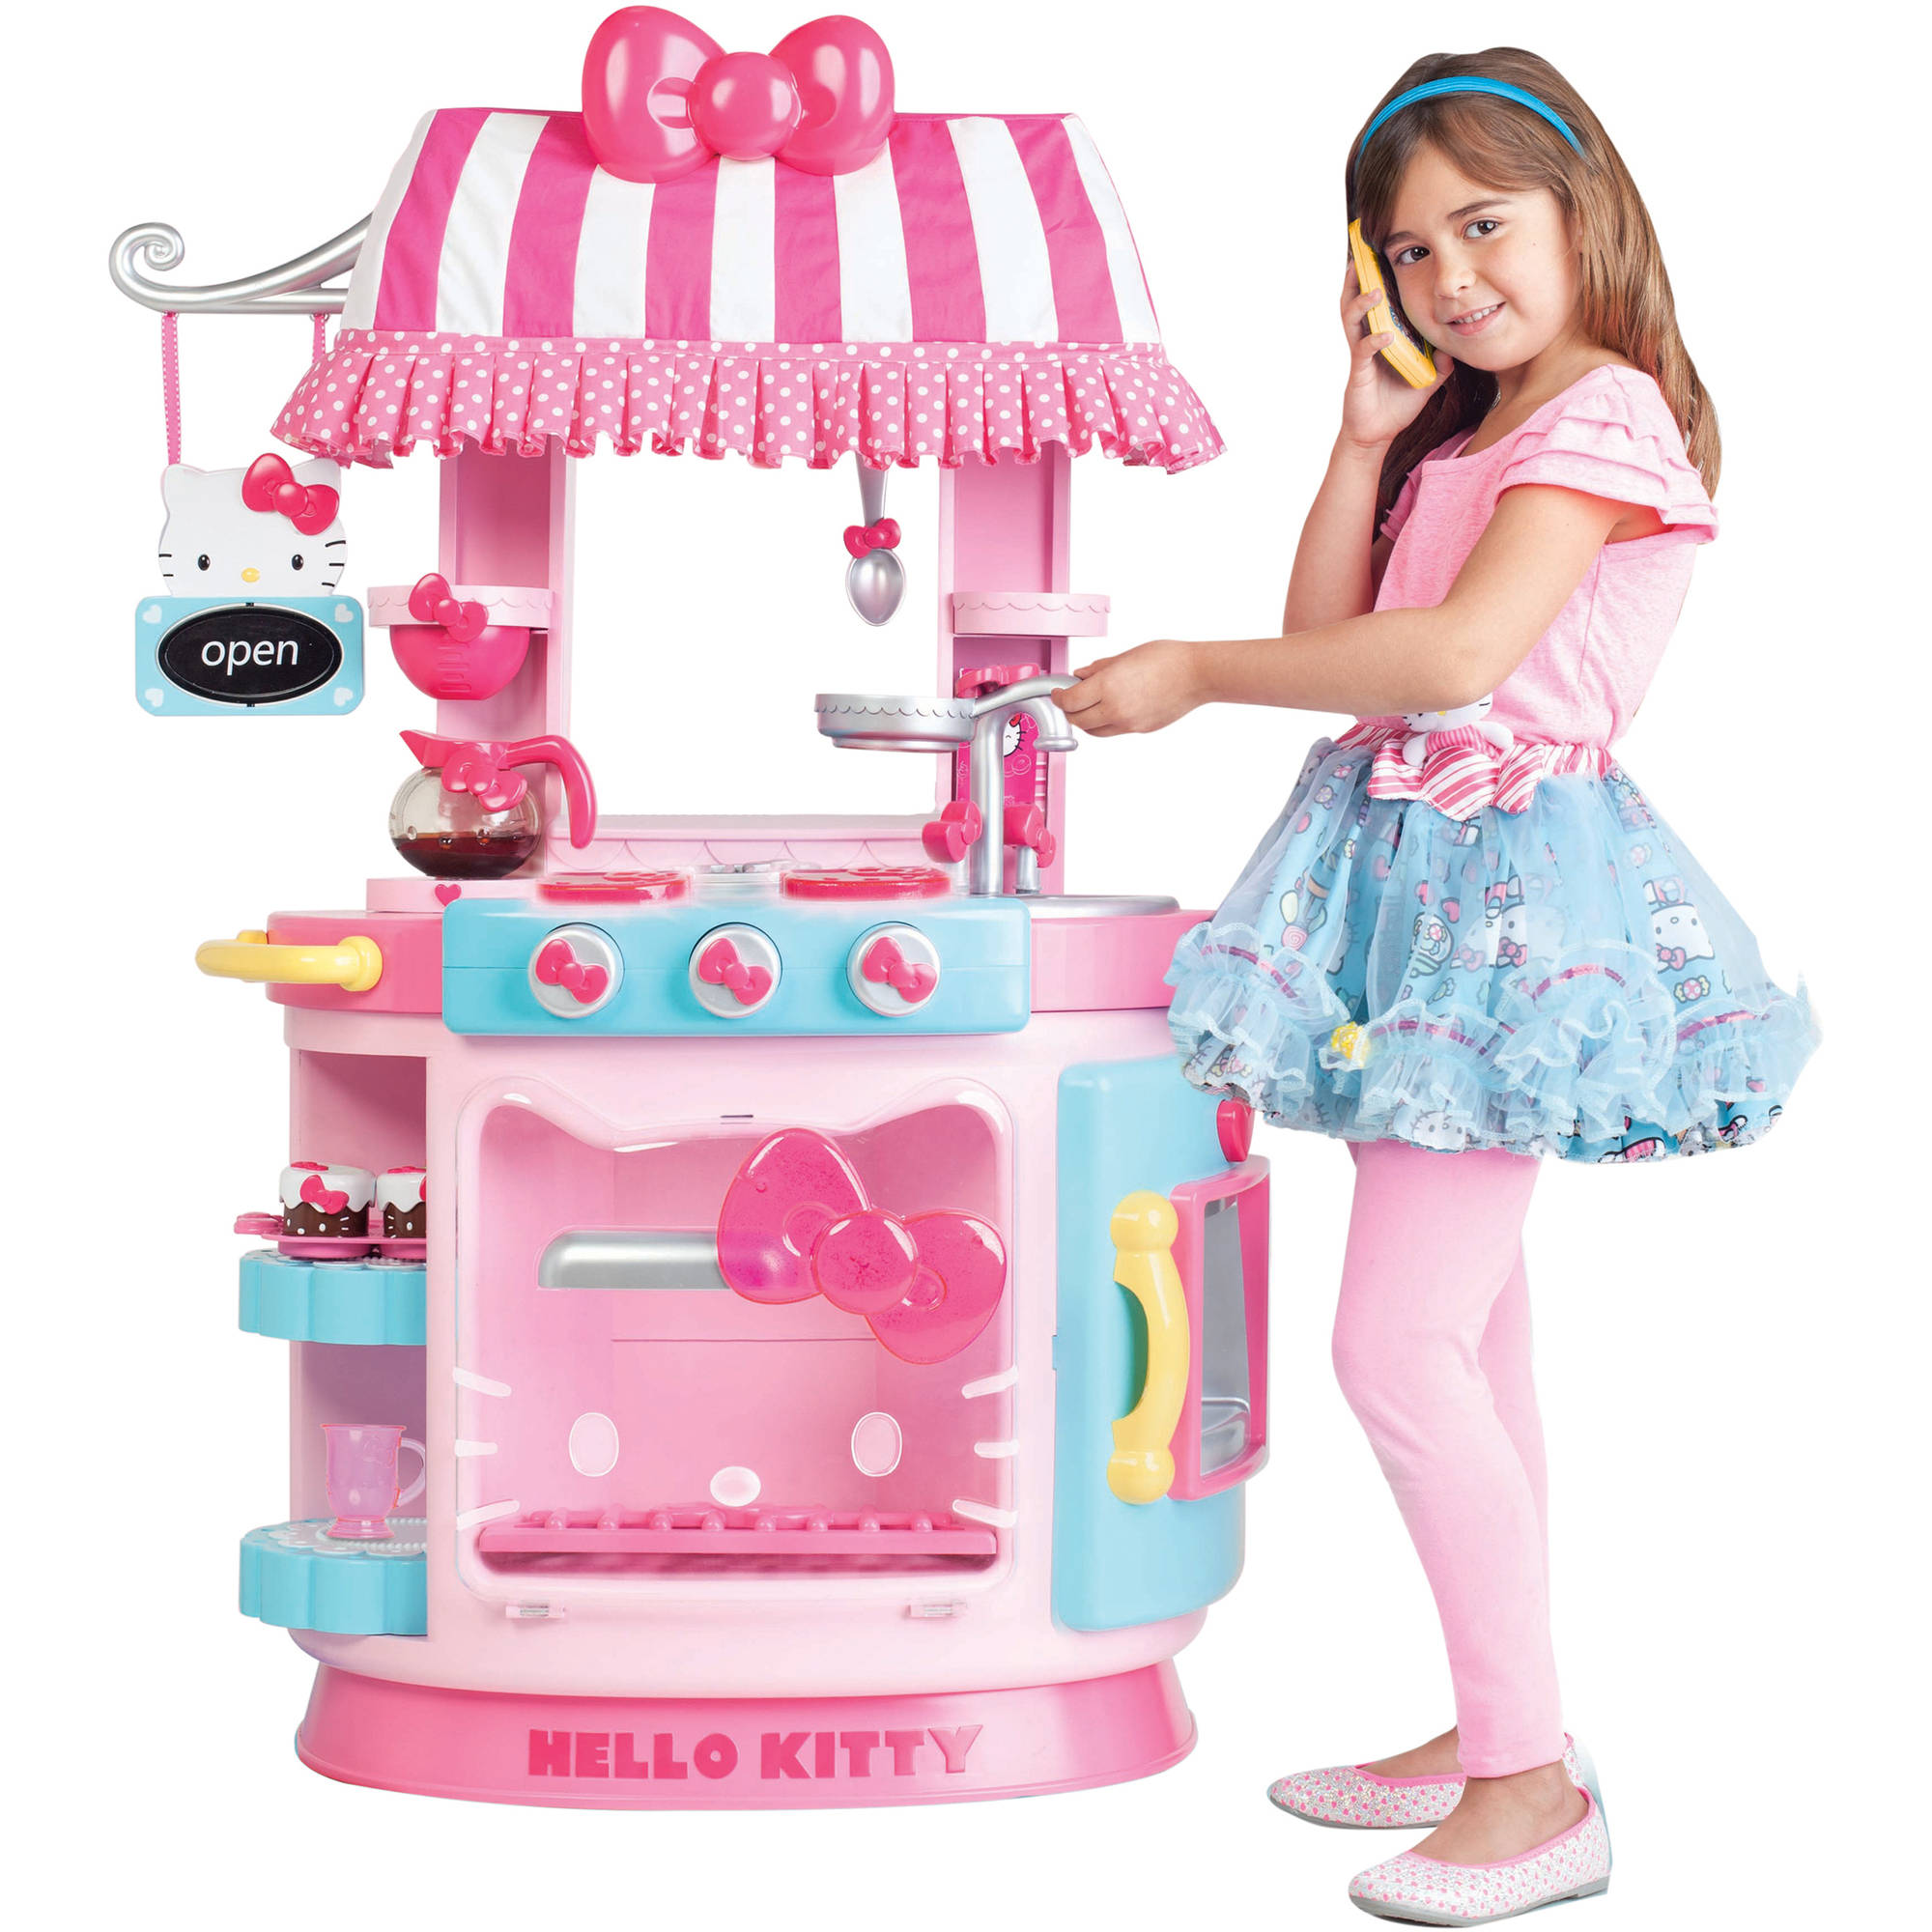 Hello Kitty Kitchen Cafe